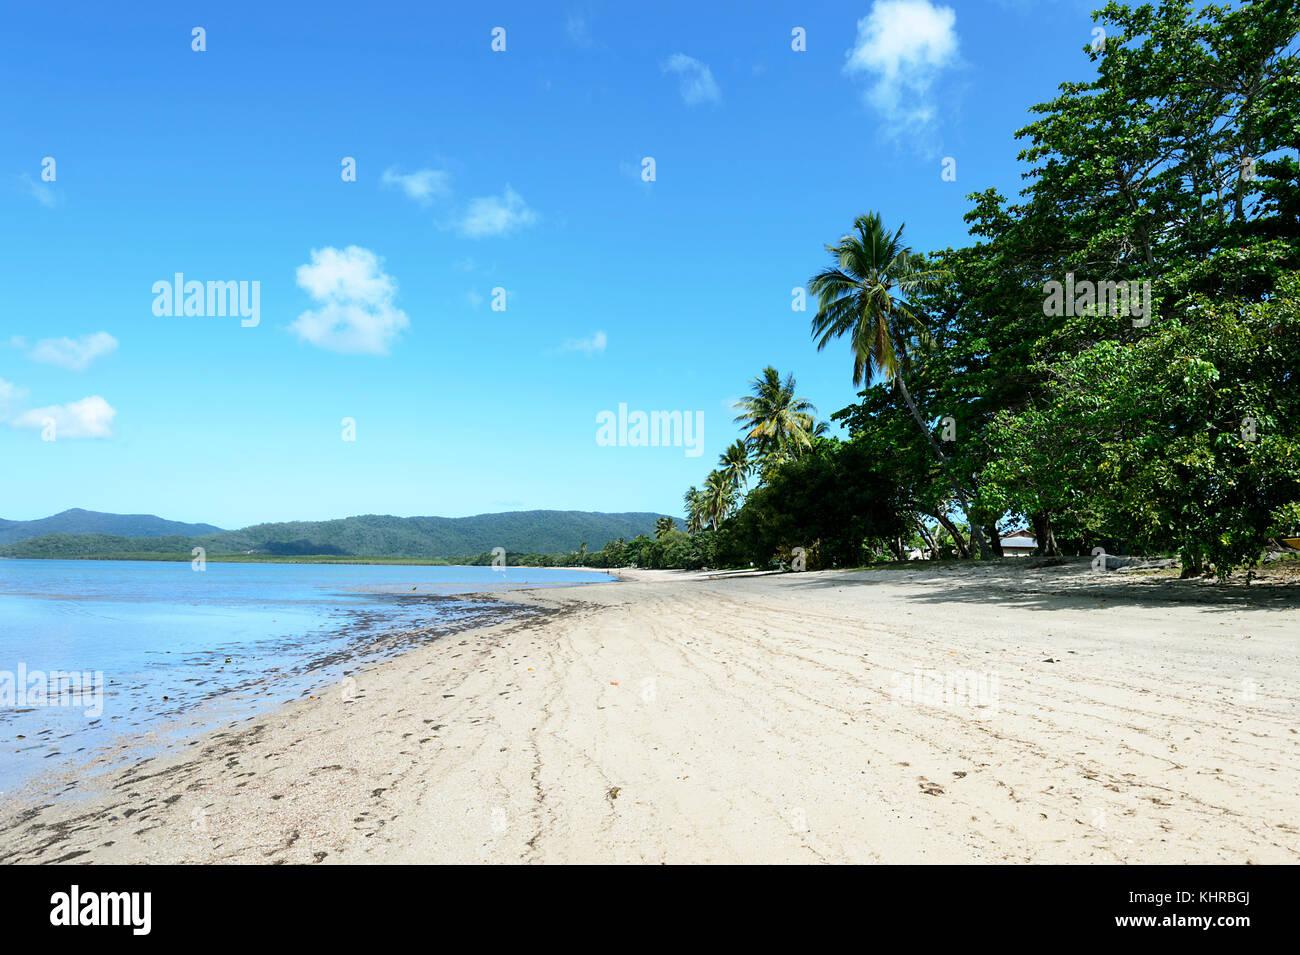 Playa de arena de la comunidad aborigen de Yarrabah, cerca de Cairns, Far North Queensland, FNQ, Queensland, Australia Imagen De Stock